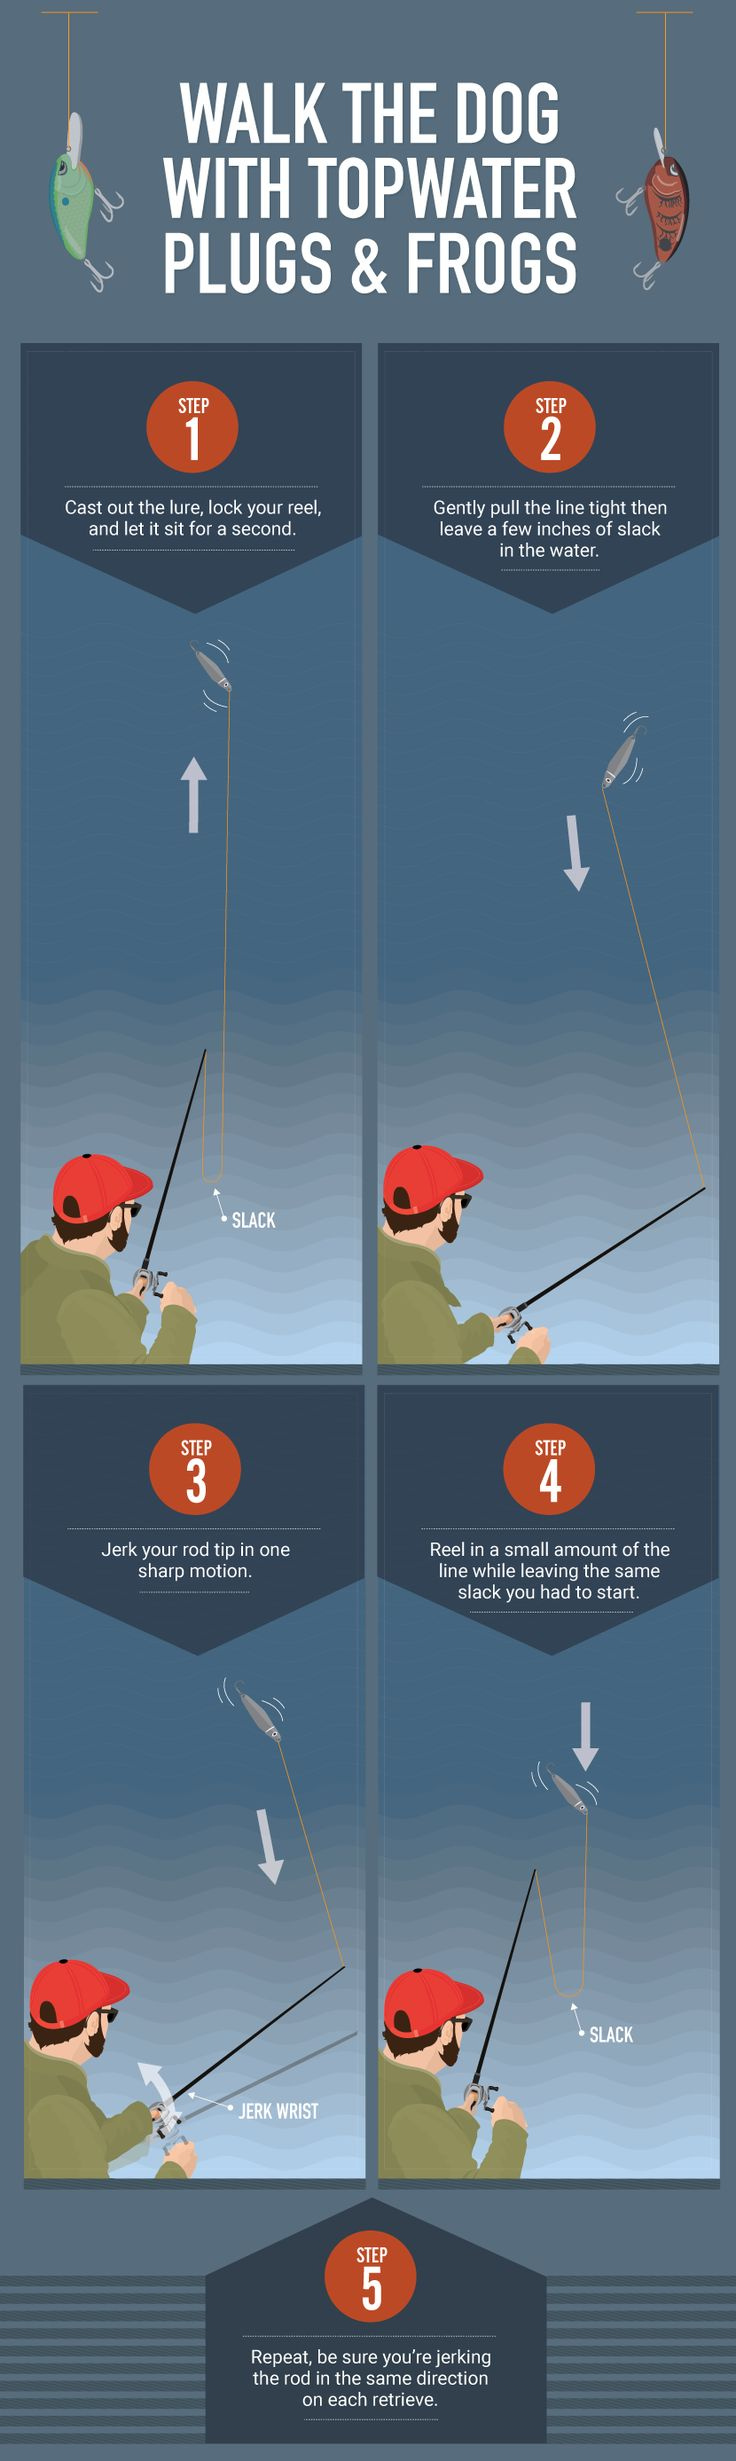 Walk The Dog - Rod Tricks Every Angler Should Know